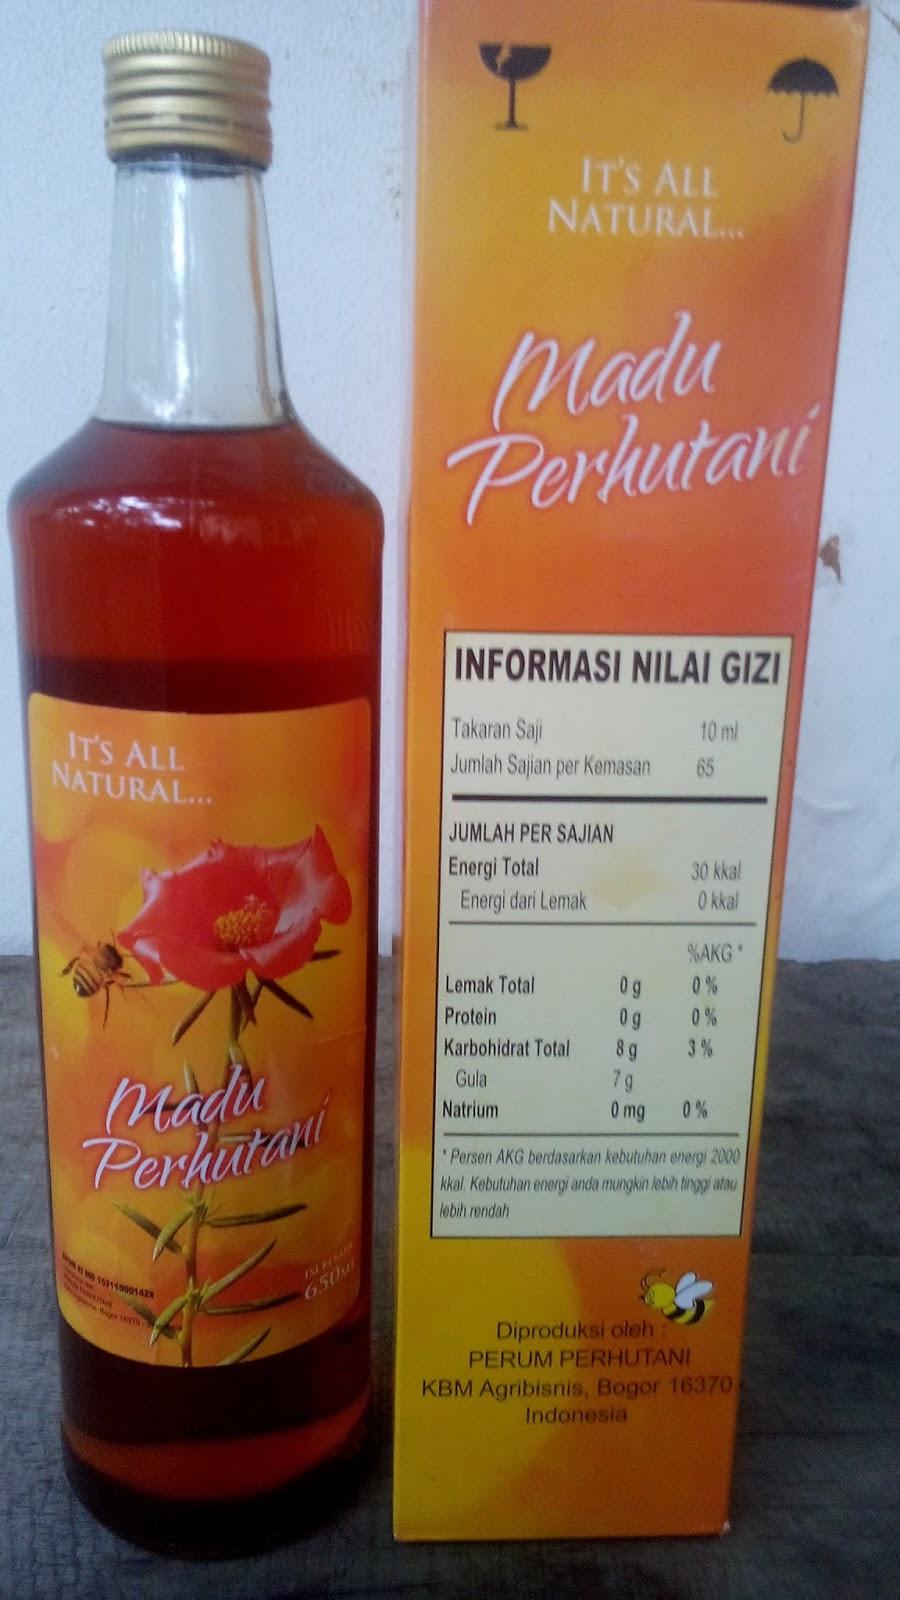 Outlet Madu Perhutani Bandung Murni Nusantara 650ml Rp 150000